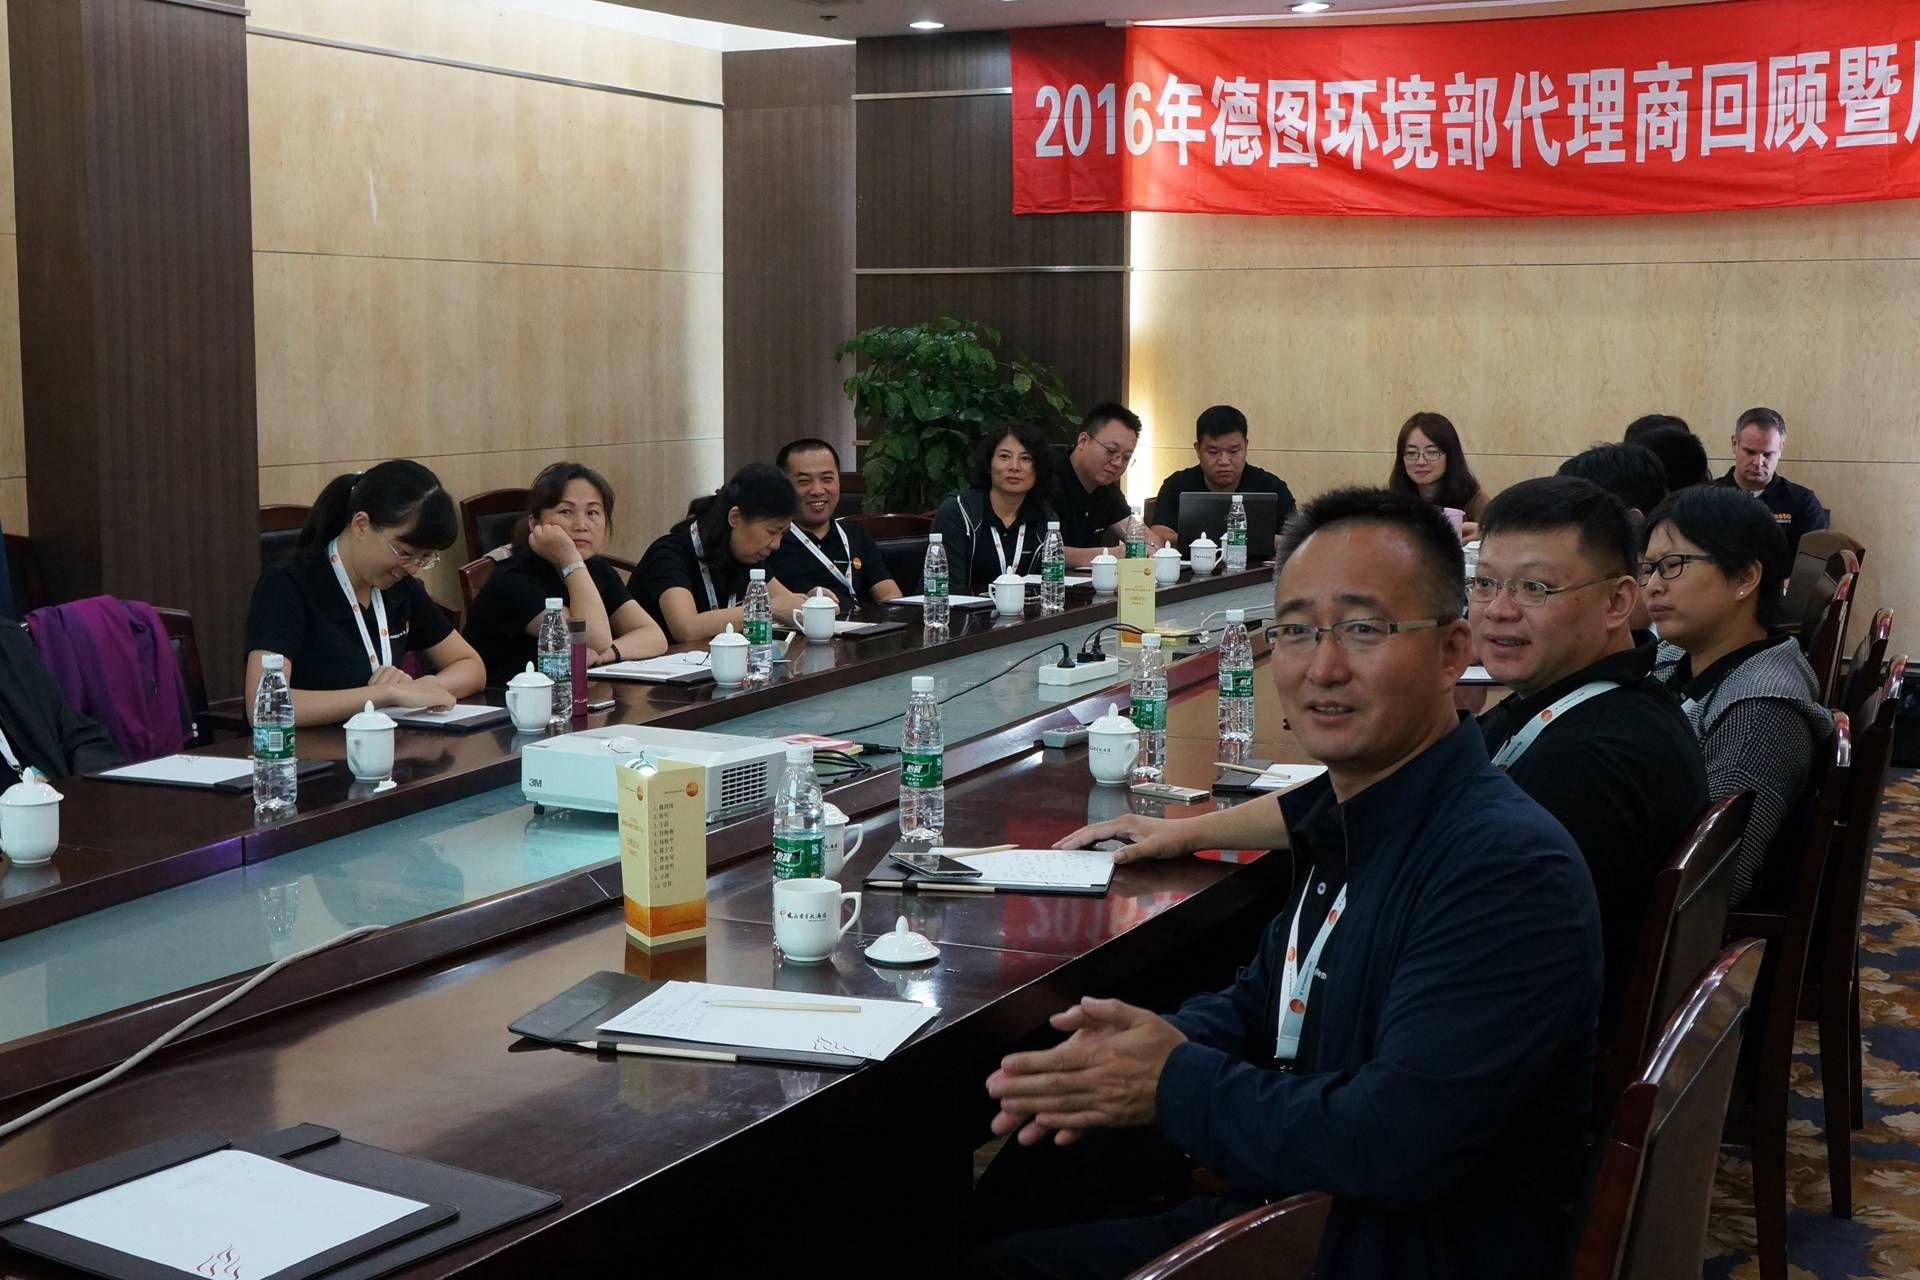 cn_company_news_dali_0303.jpg